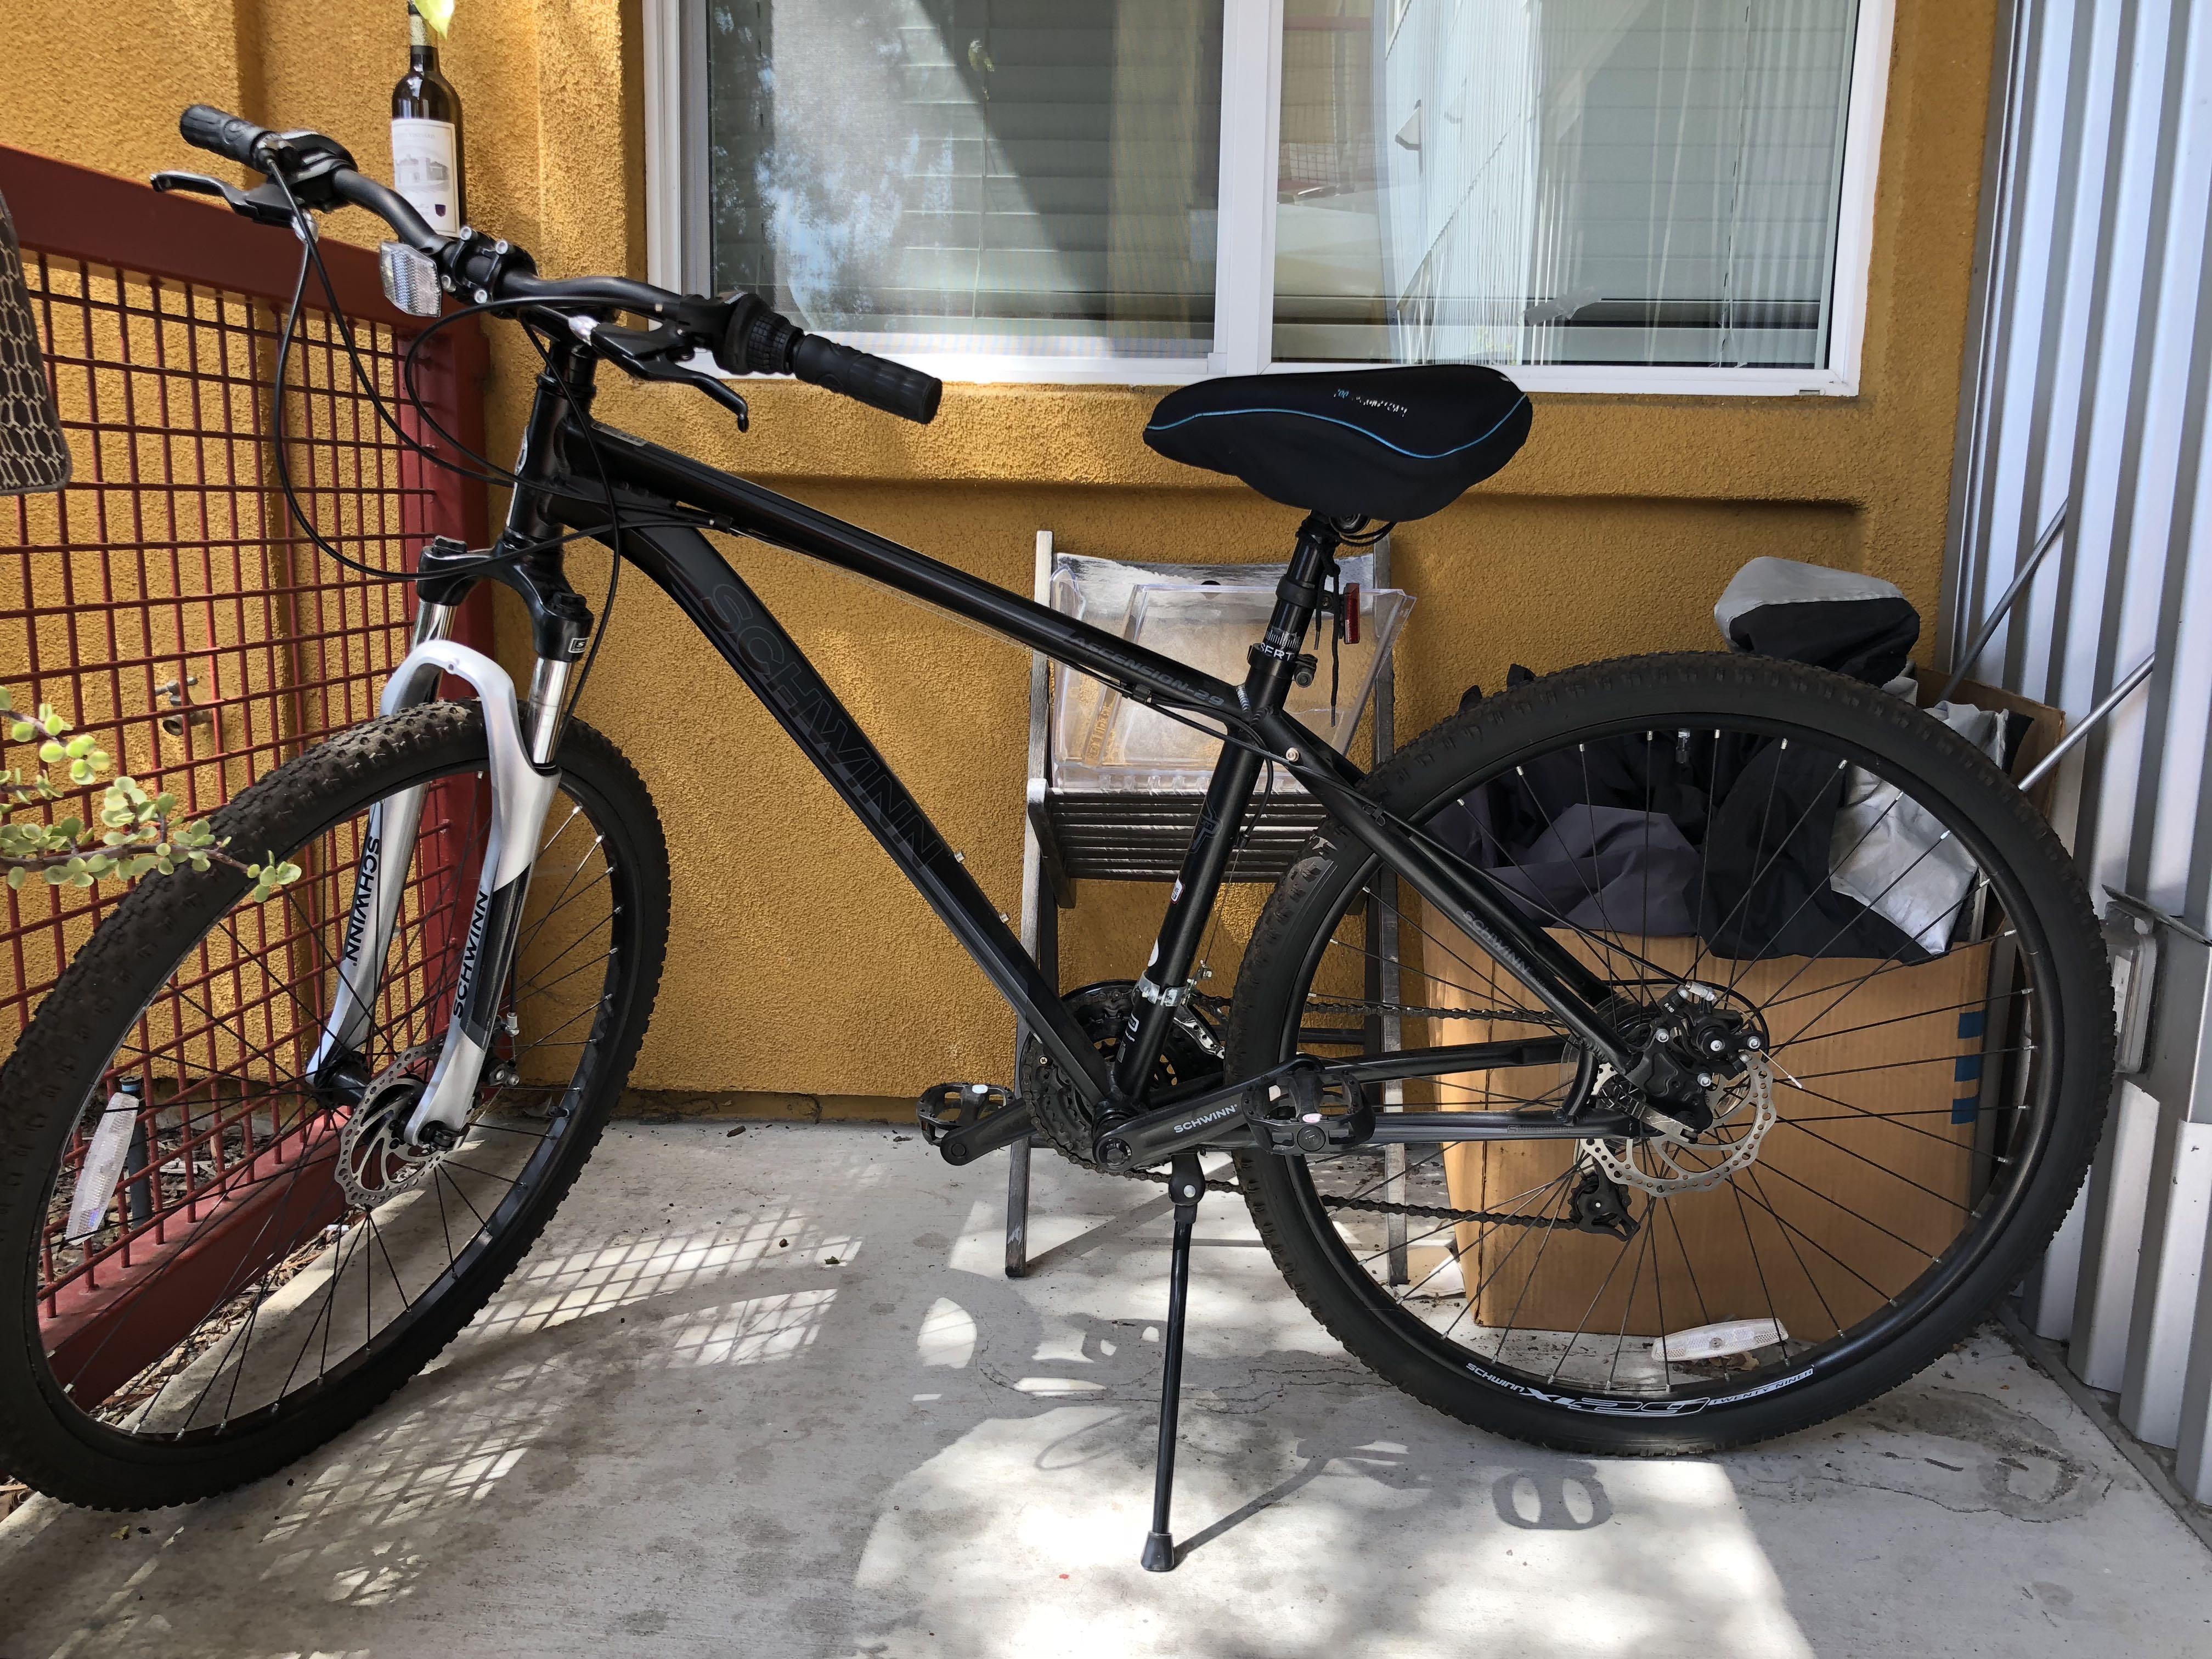 2017 Schwinn Ascension 29 Expired - 9268 - BicycleBlueBook com